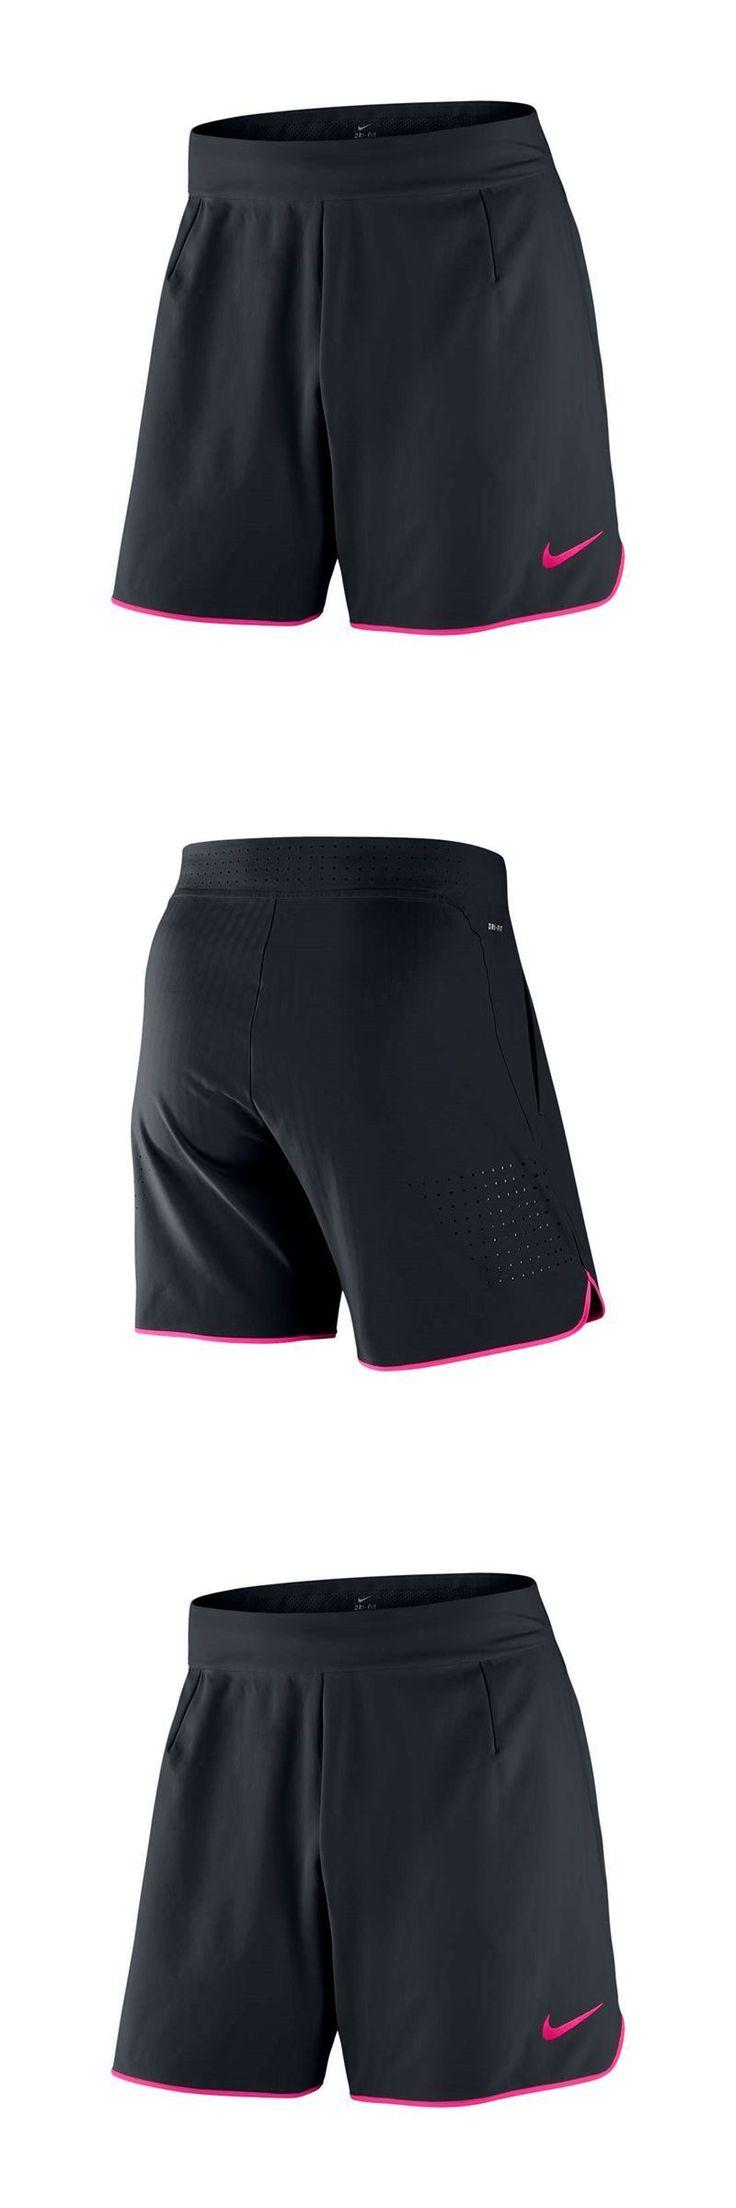 Shorts 70902: Nike Court Flex Tennis Short - Black Hyper Pink -> BUY IT NOW ONLY: $59.97 on eBay!